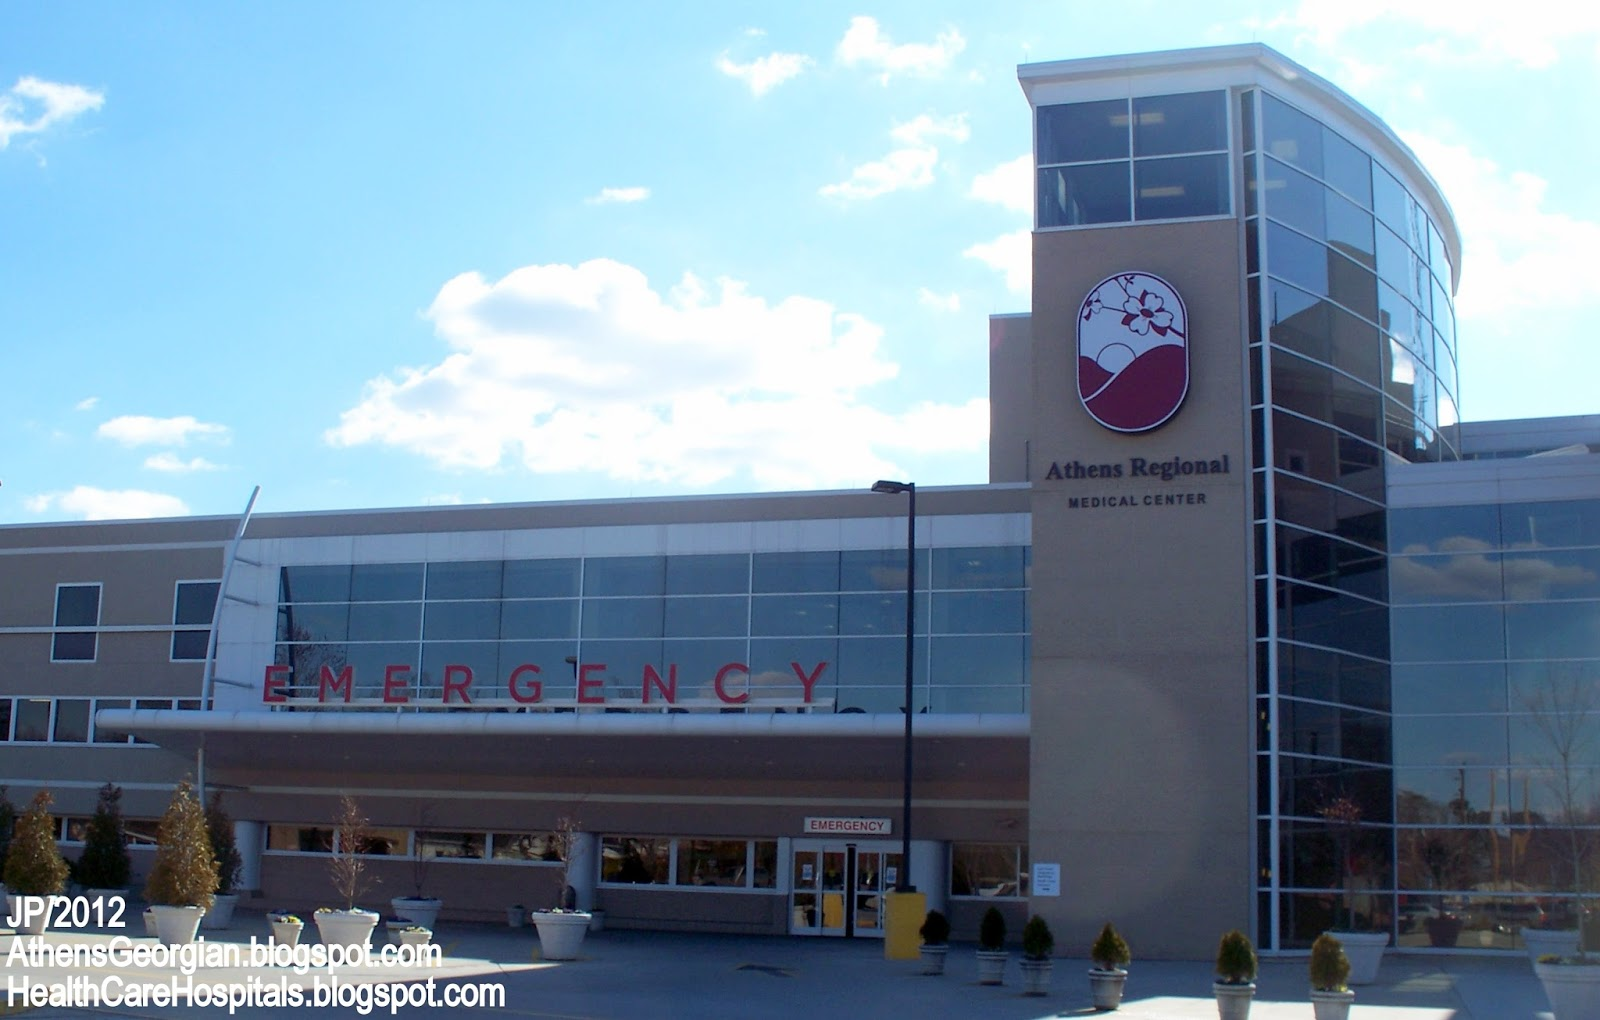 Northeast Goergia Medical Center Emergency Room Number